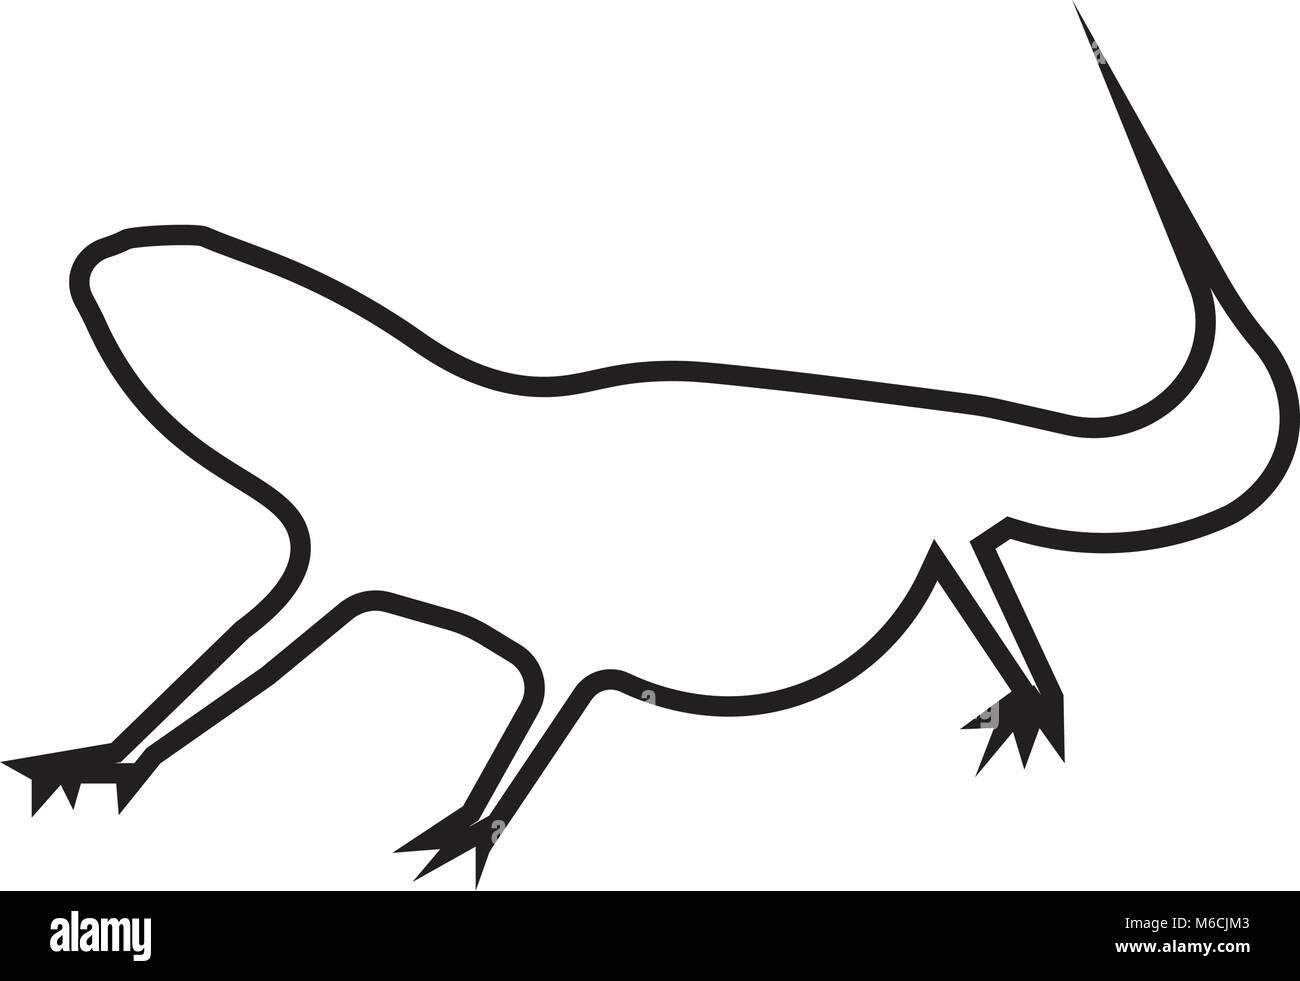 Bearded Dragon Silhouette Outline On White Background Stock Vector